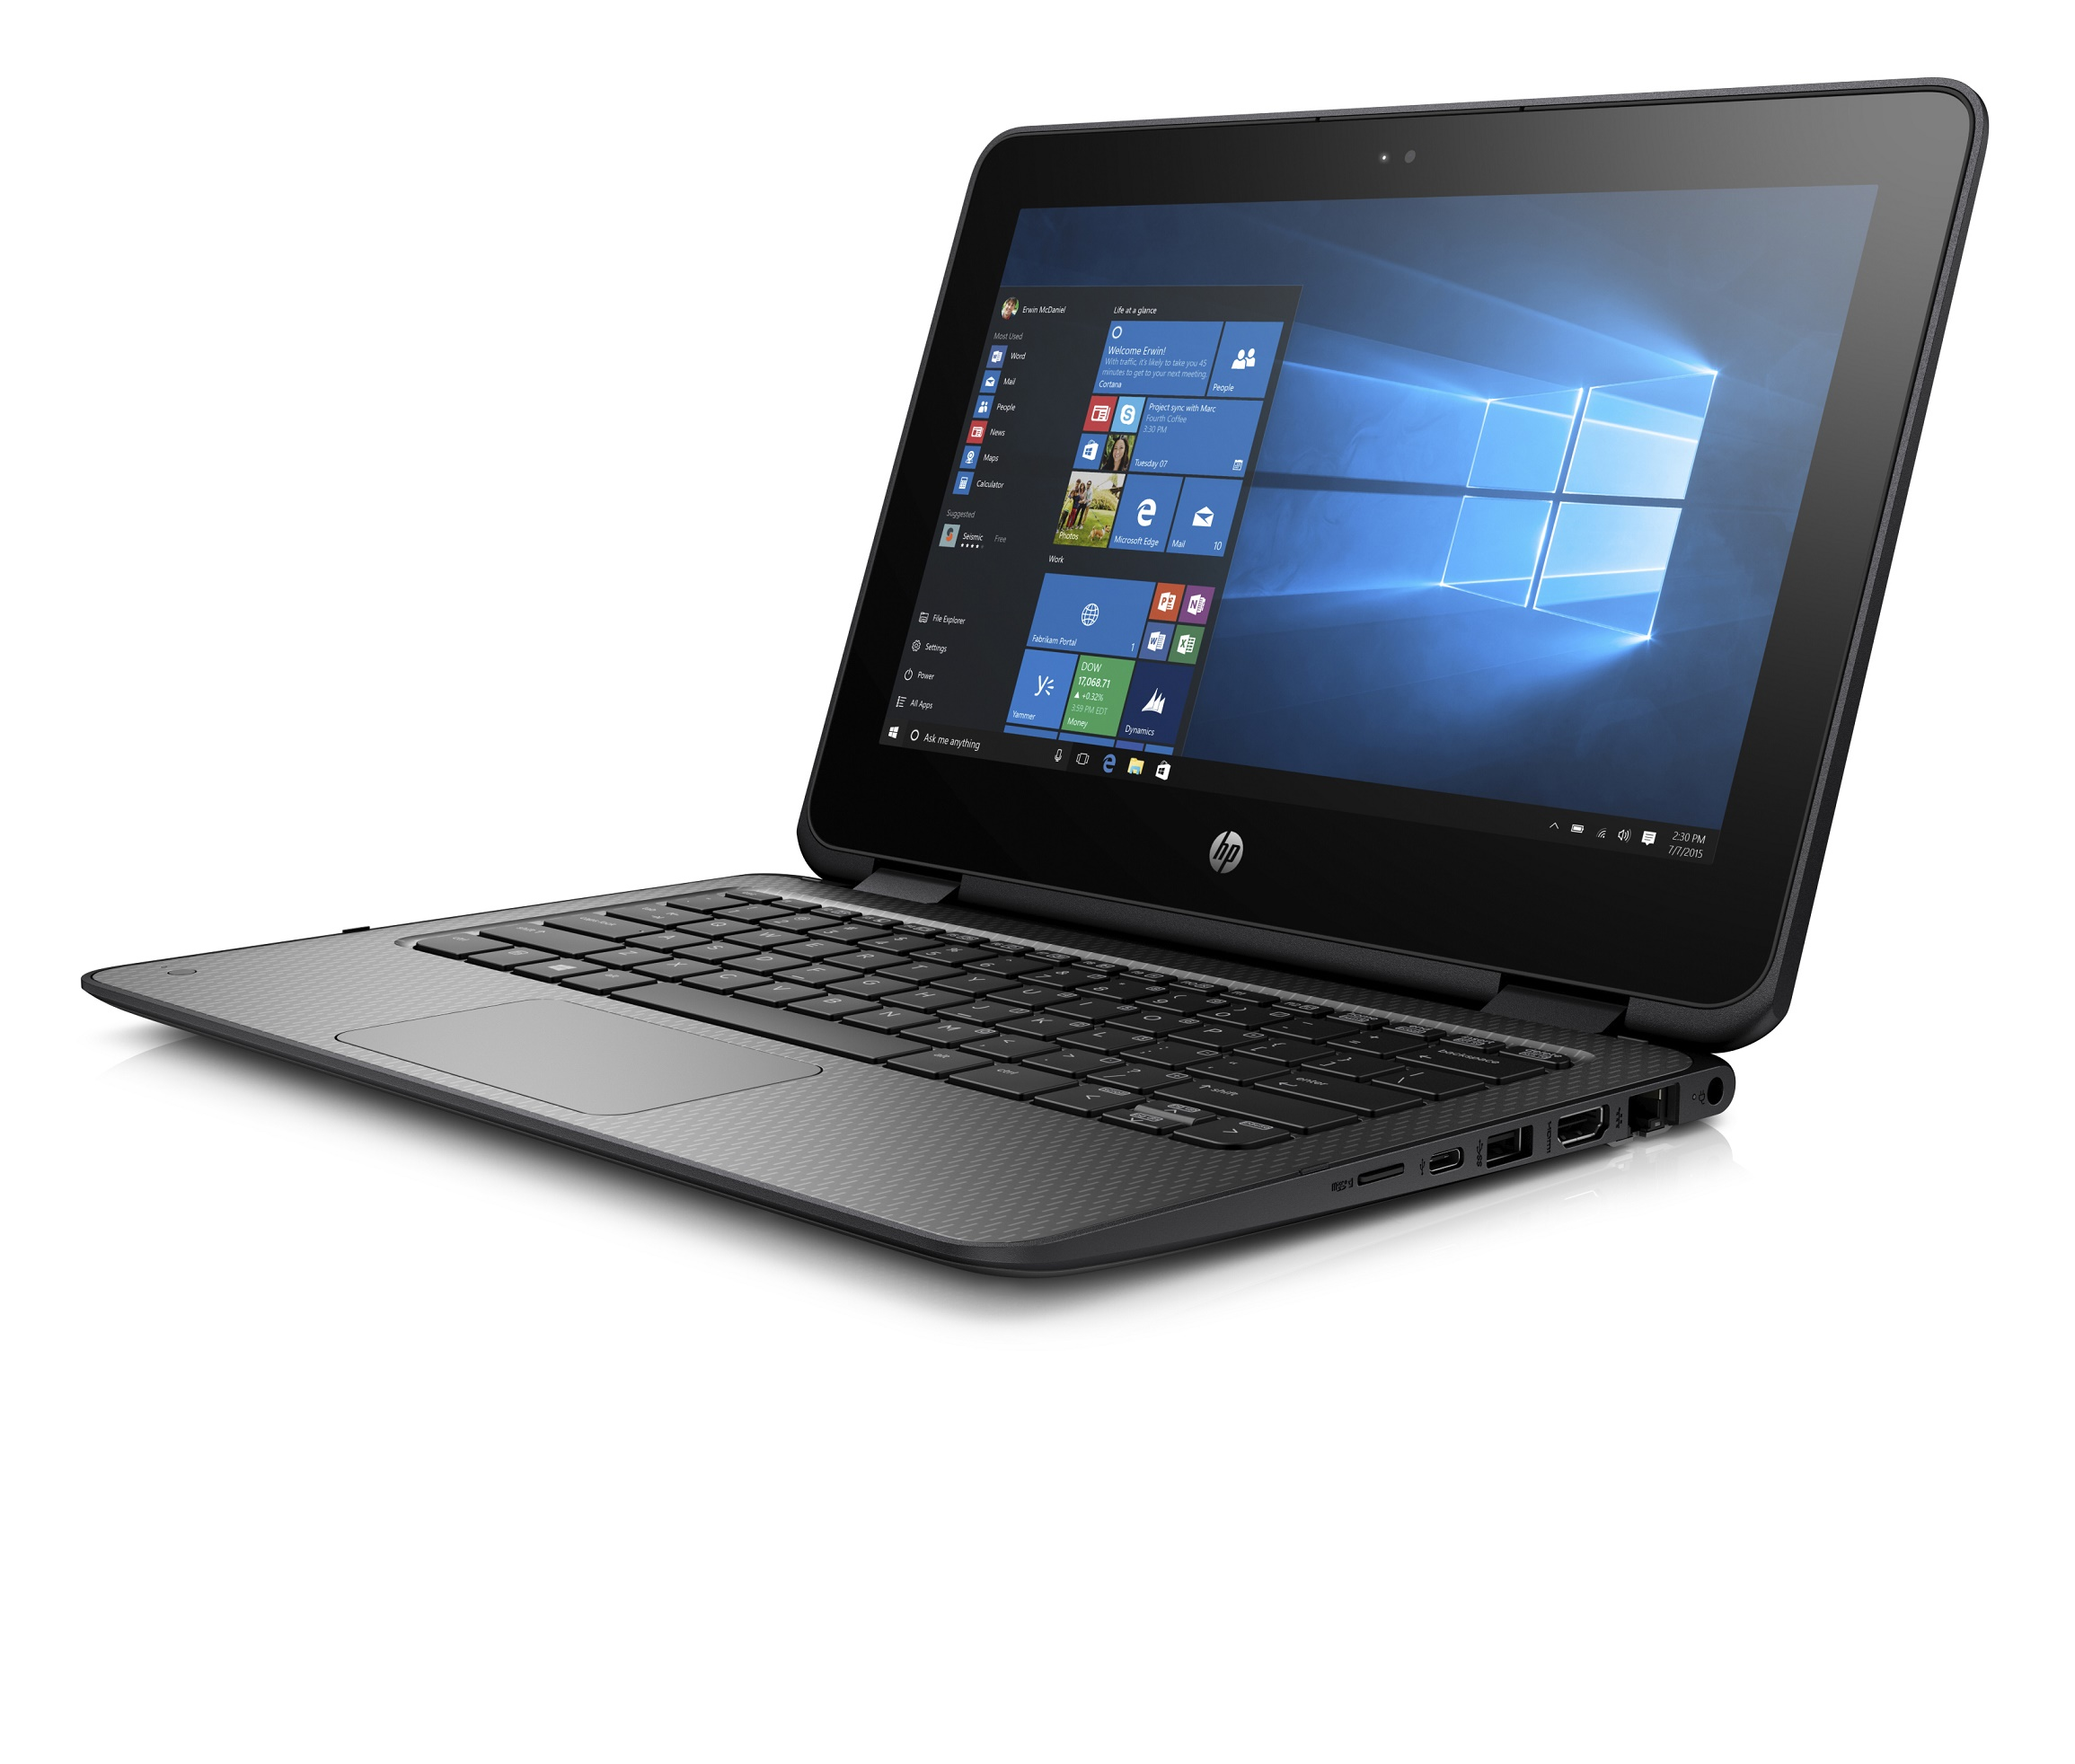 HP ProBook X360 11 G1 Education Edition